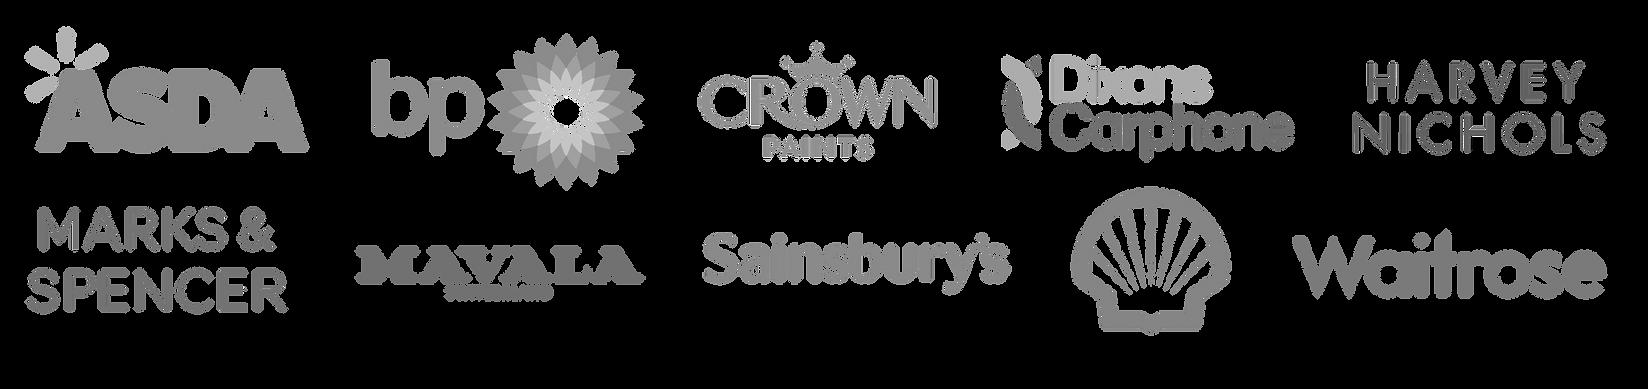 maxim client logo block 2018 - greyscale